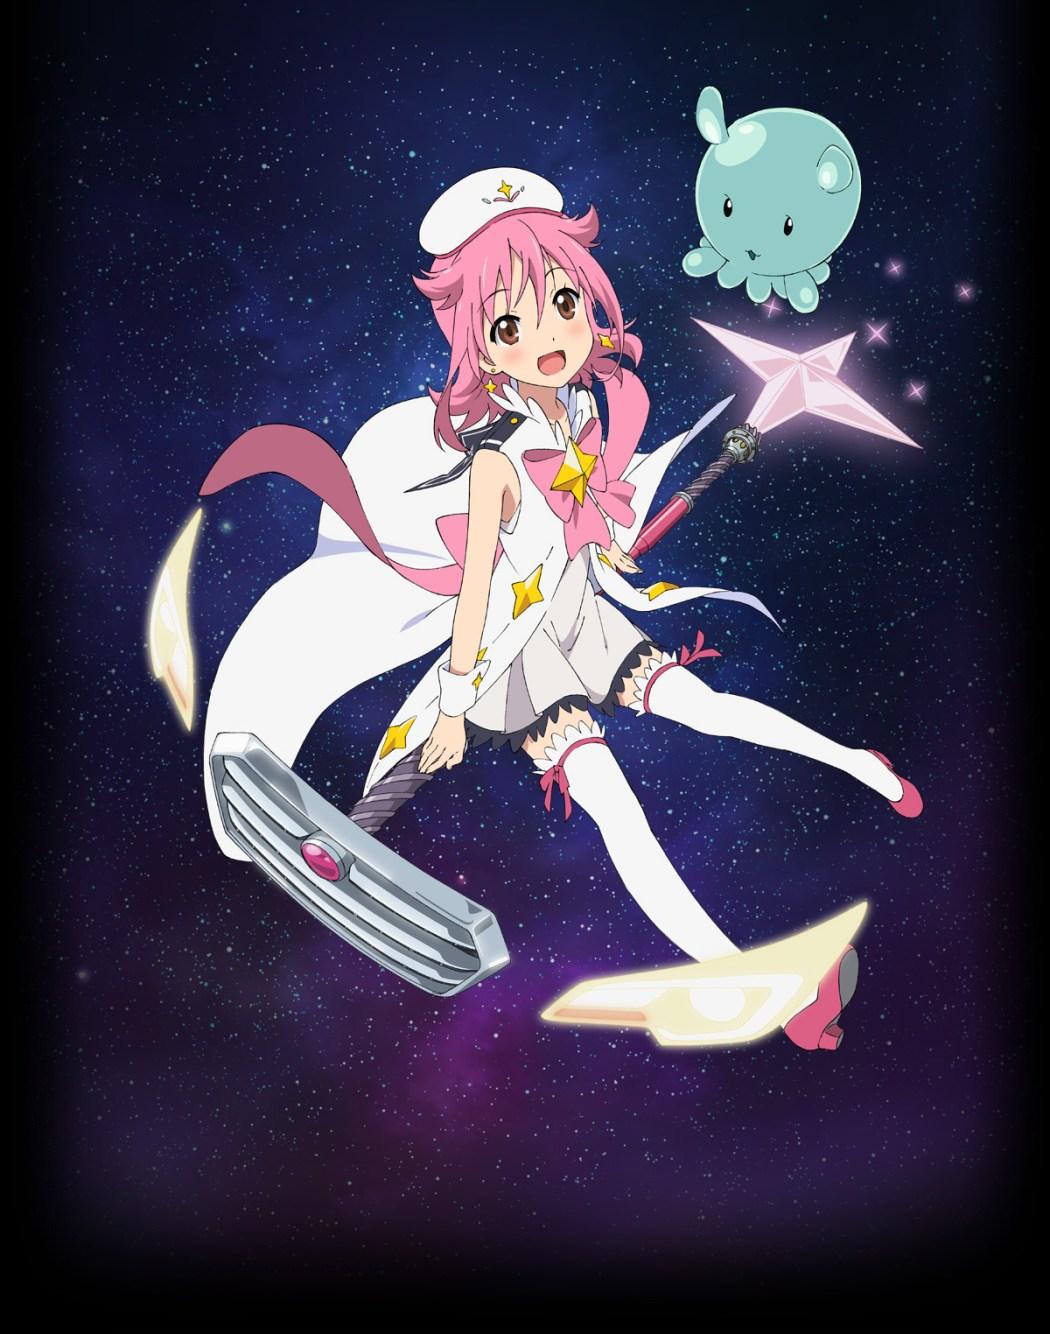 Houkago no Pleiades character design haruhichan.com wish upon the pleiades character design Subaru